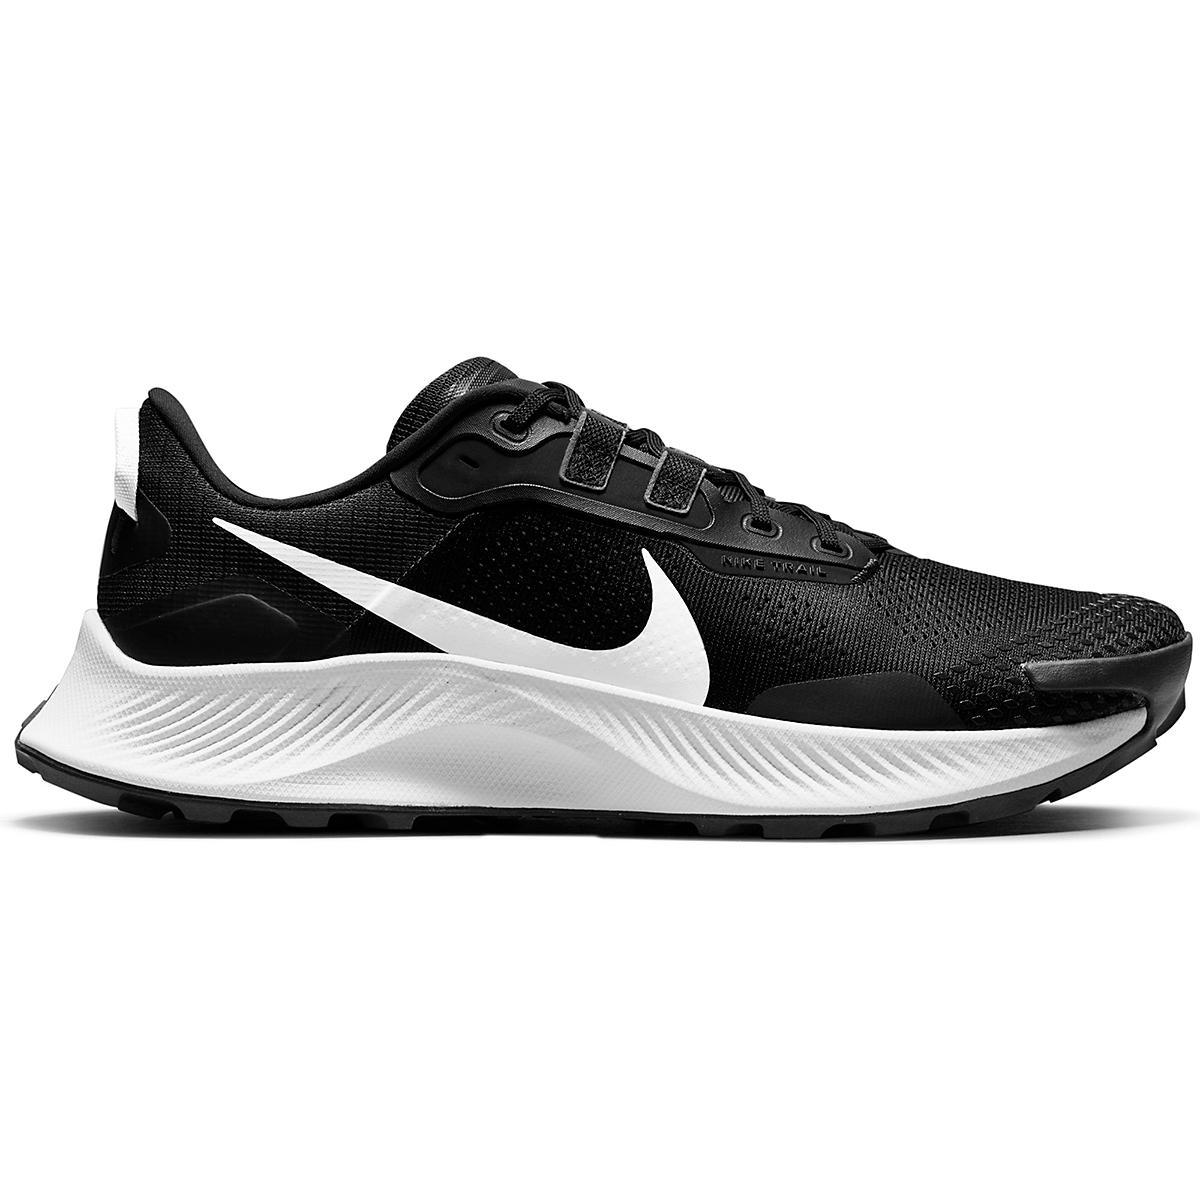 Men's Nike Pegasus Trail 3 Trail Running Shoe  - Color: Black/Pure Platinum/Dark Smoke Grey  - Size: 6 - Width: Regular, Black/Pure Platinum/Dark Smoke Grey, large, image 1